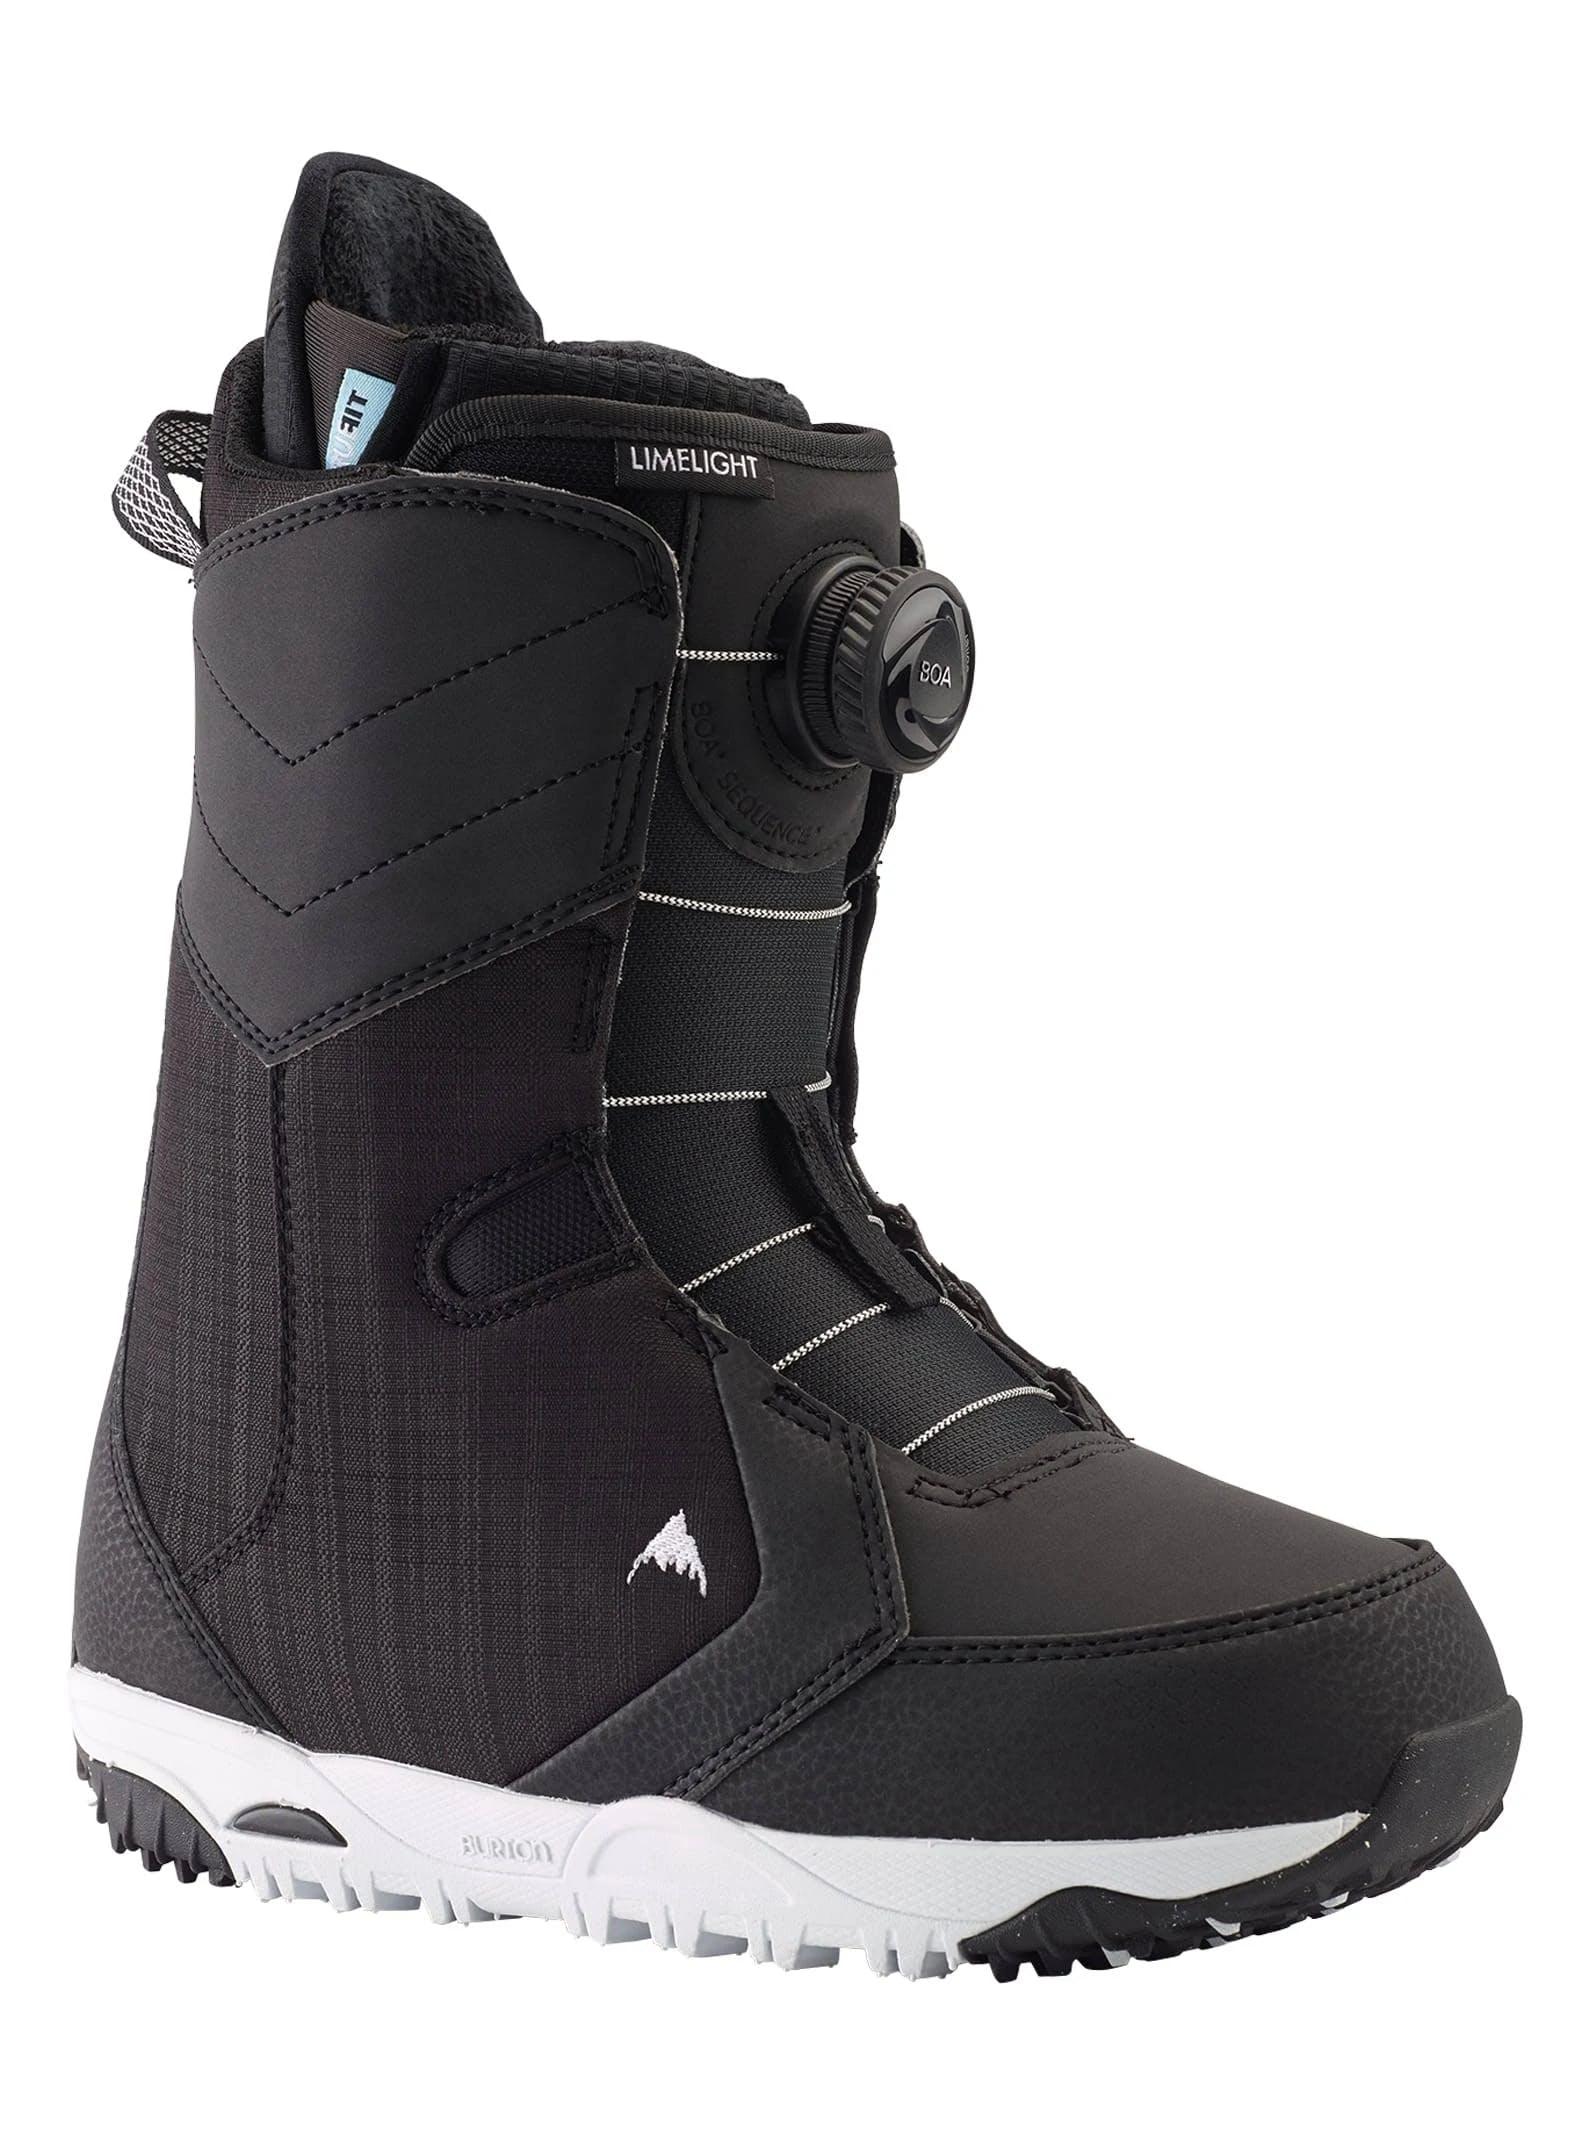 Burton Limelight BOA Snowboard Boots Women's  6 · 2020